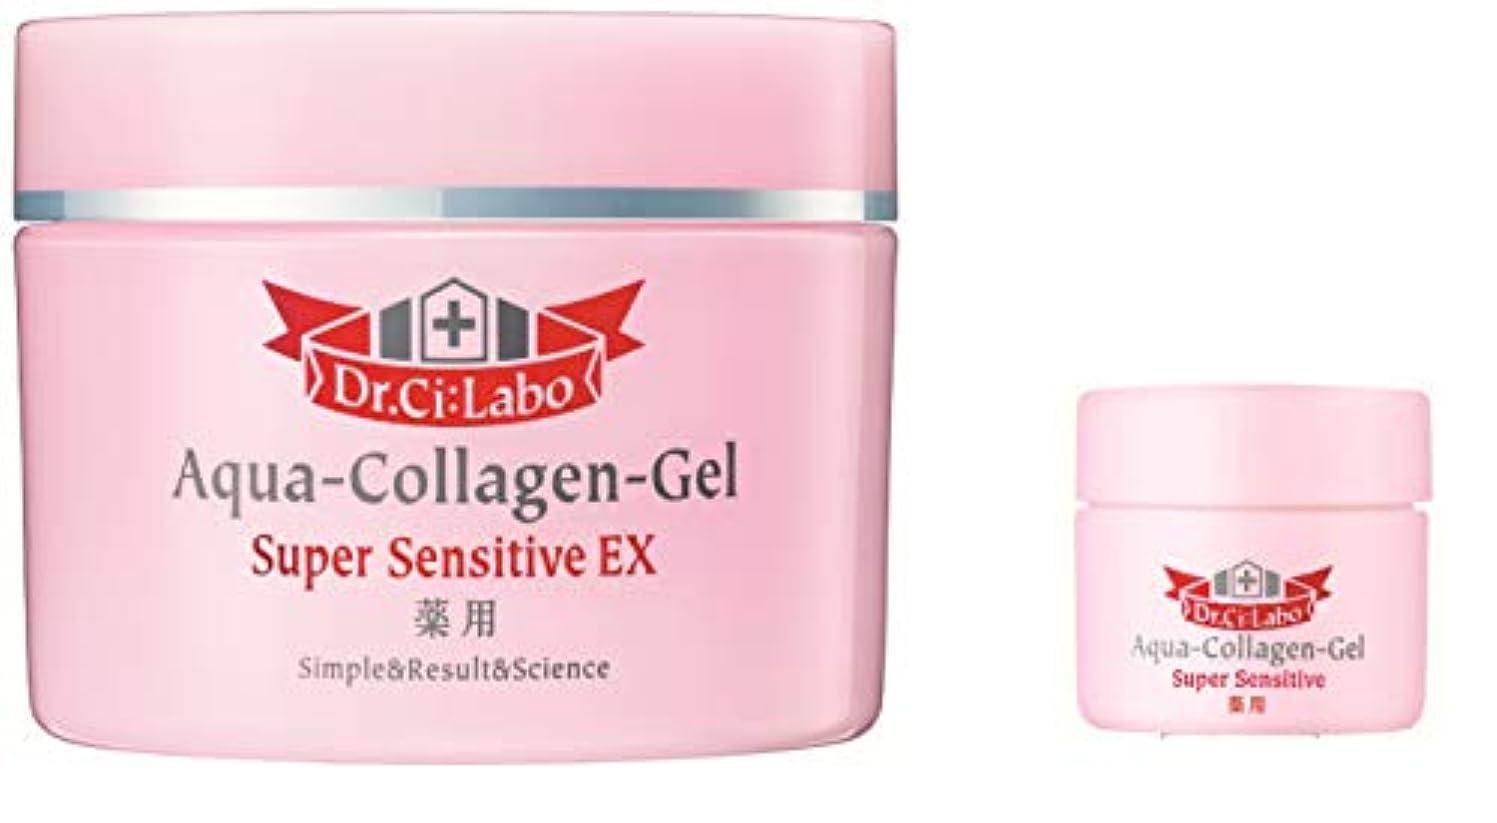 【Amazon.co.jp限定】 ドクターシーラボ 薬用アクアコラーゲンゲルスーパーセンシティブEX120g+15g オールインワン セット